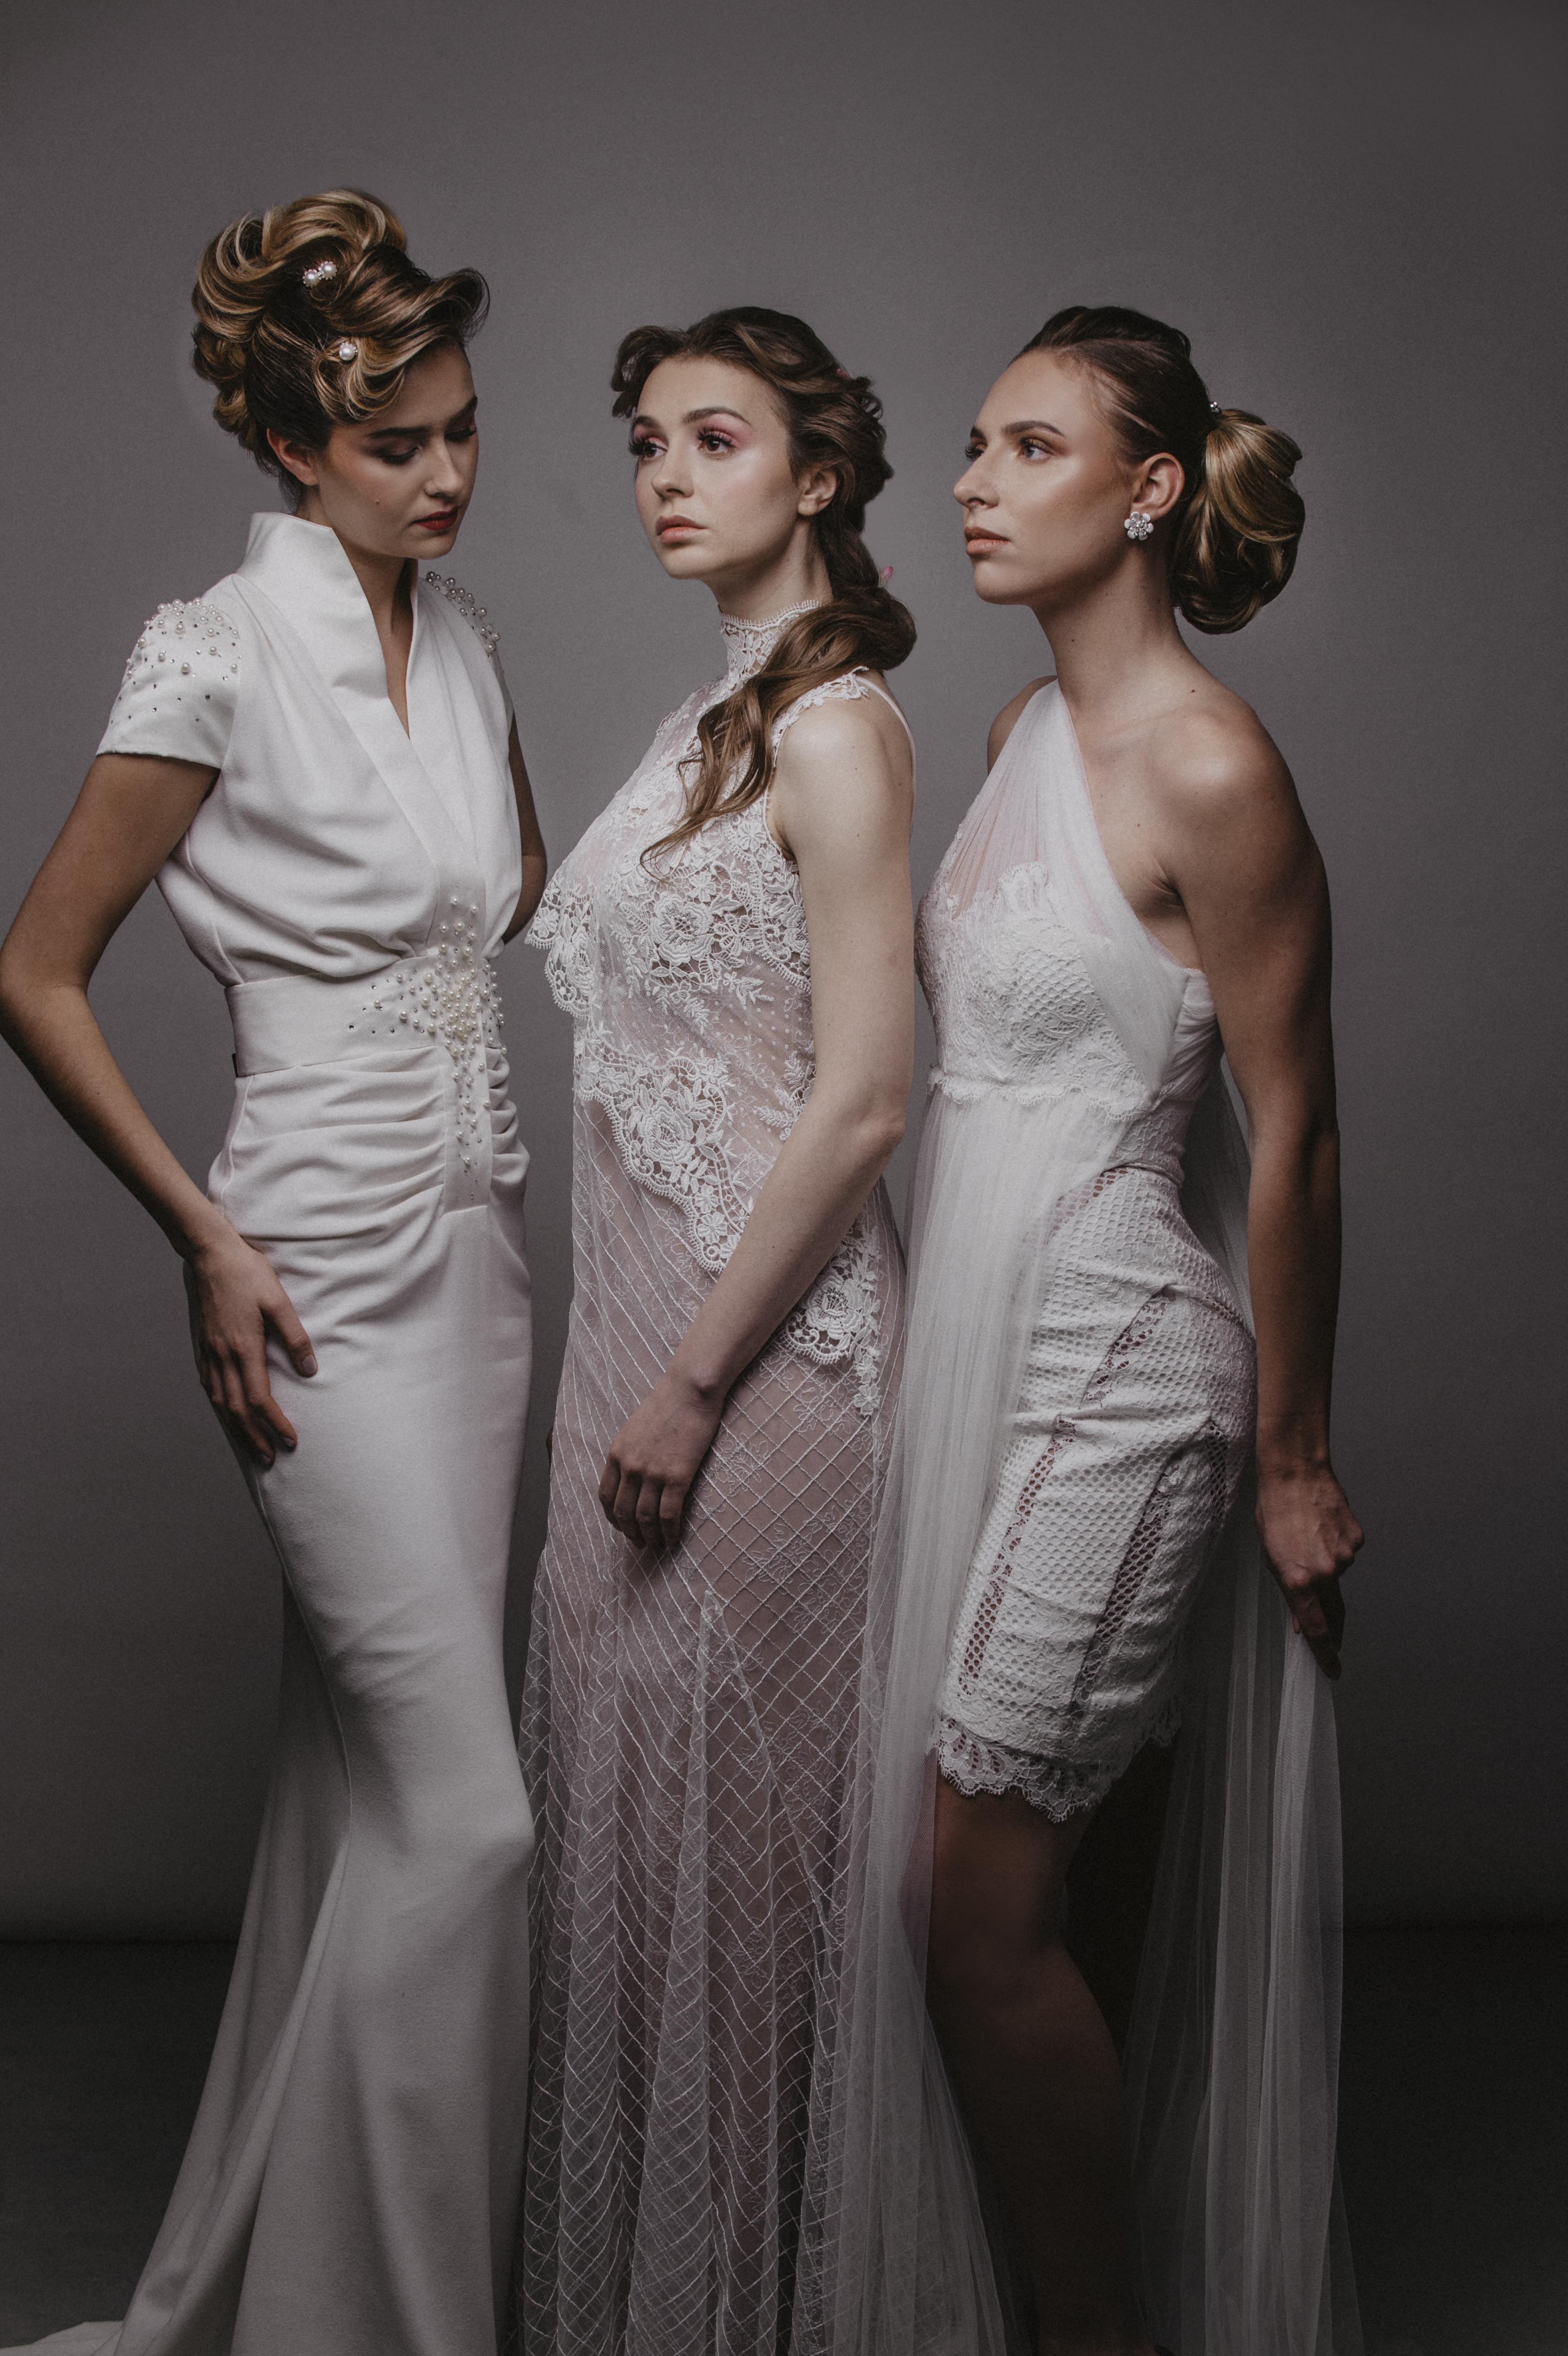 Coiffure : Fabrizio Castellano, maquillage : Alesandro Gentile, stylisme : Jacqueline Lienard, photos : Vision Photographie.